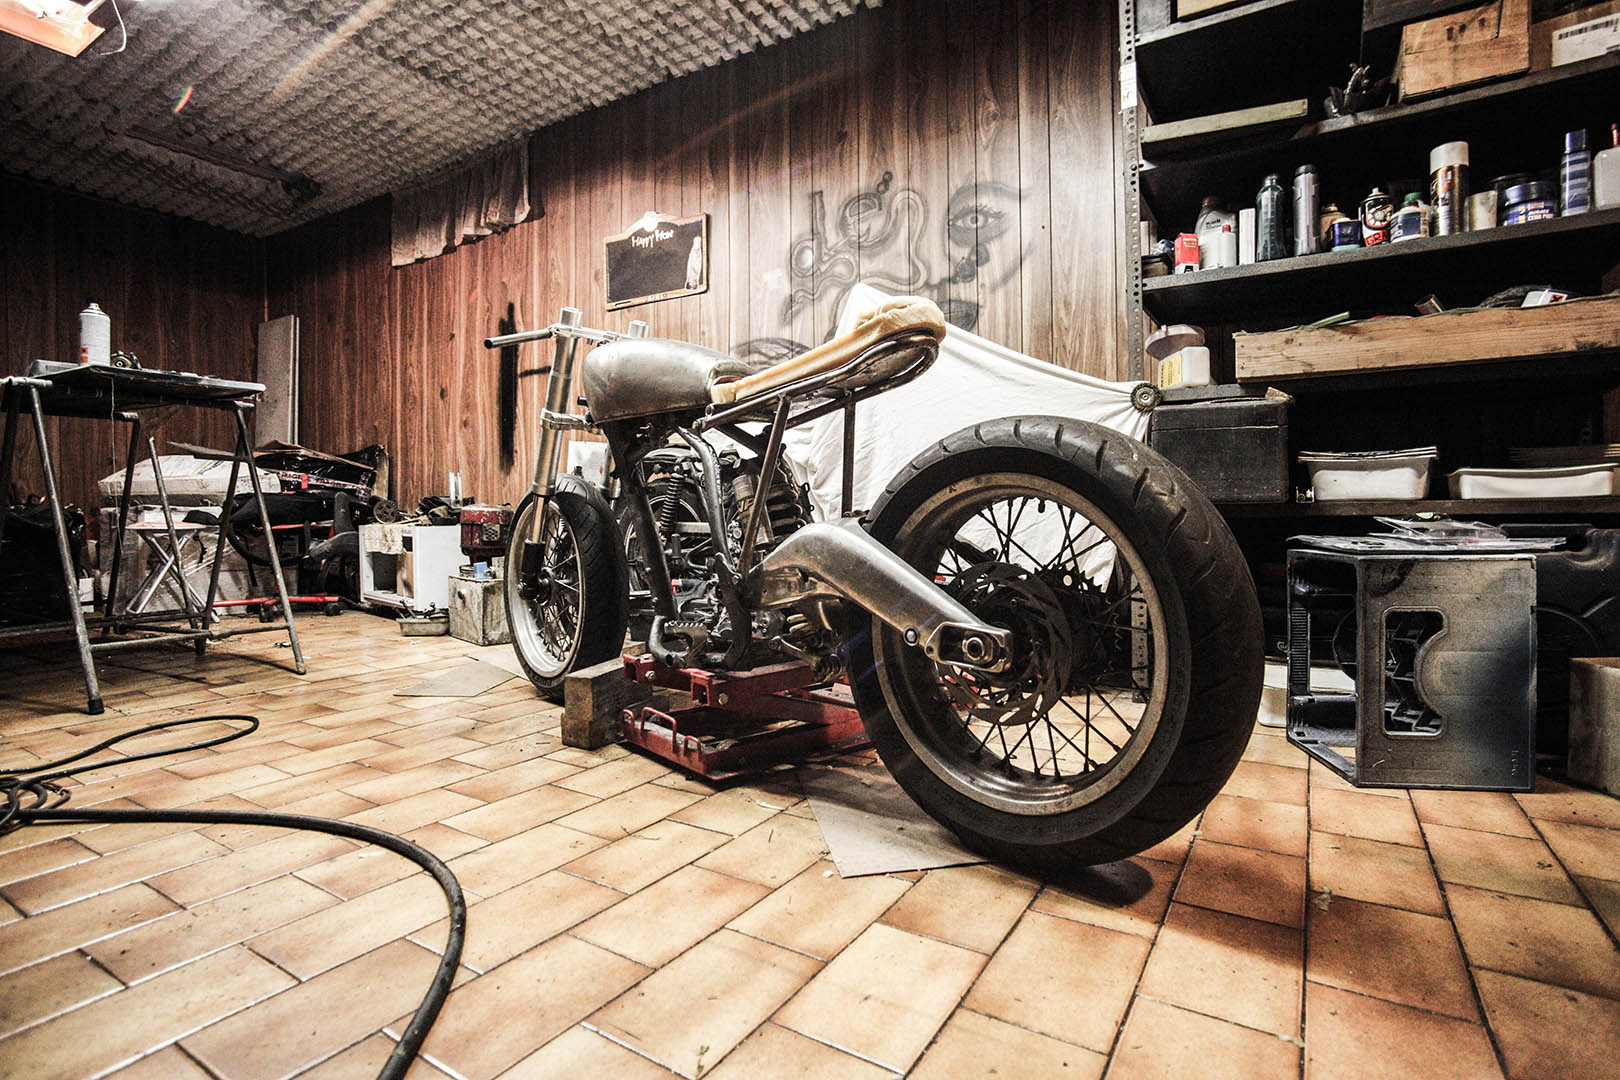 Beginner's Short Guide On Motorcycle Repair Tool Basics